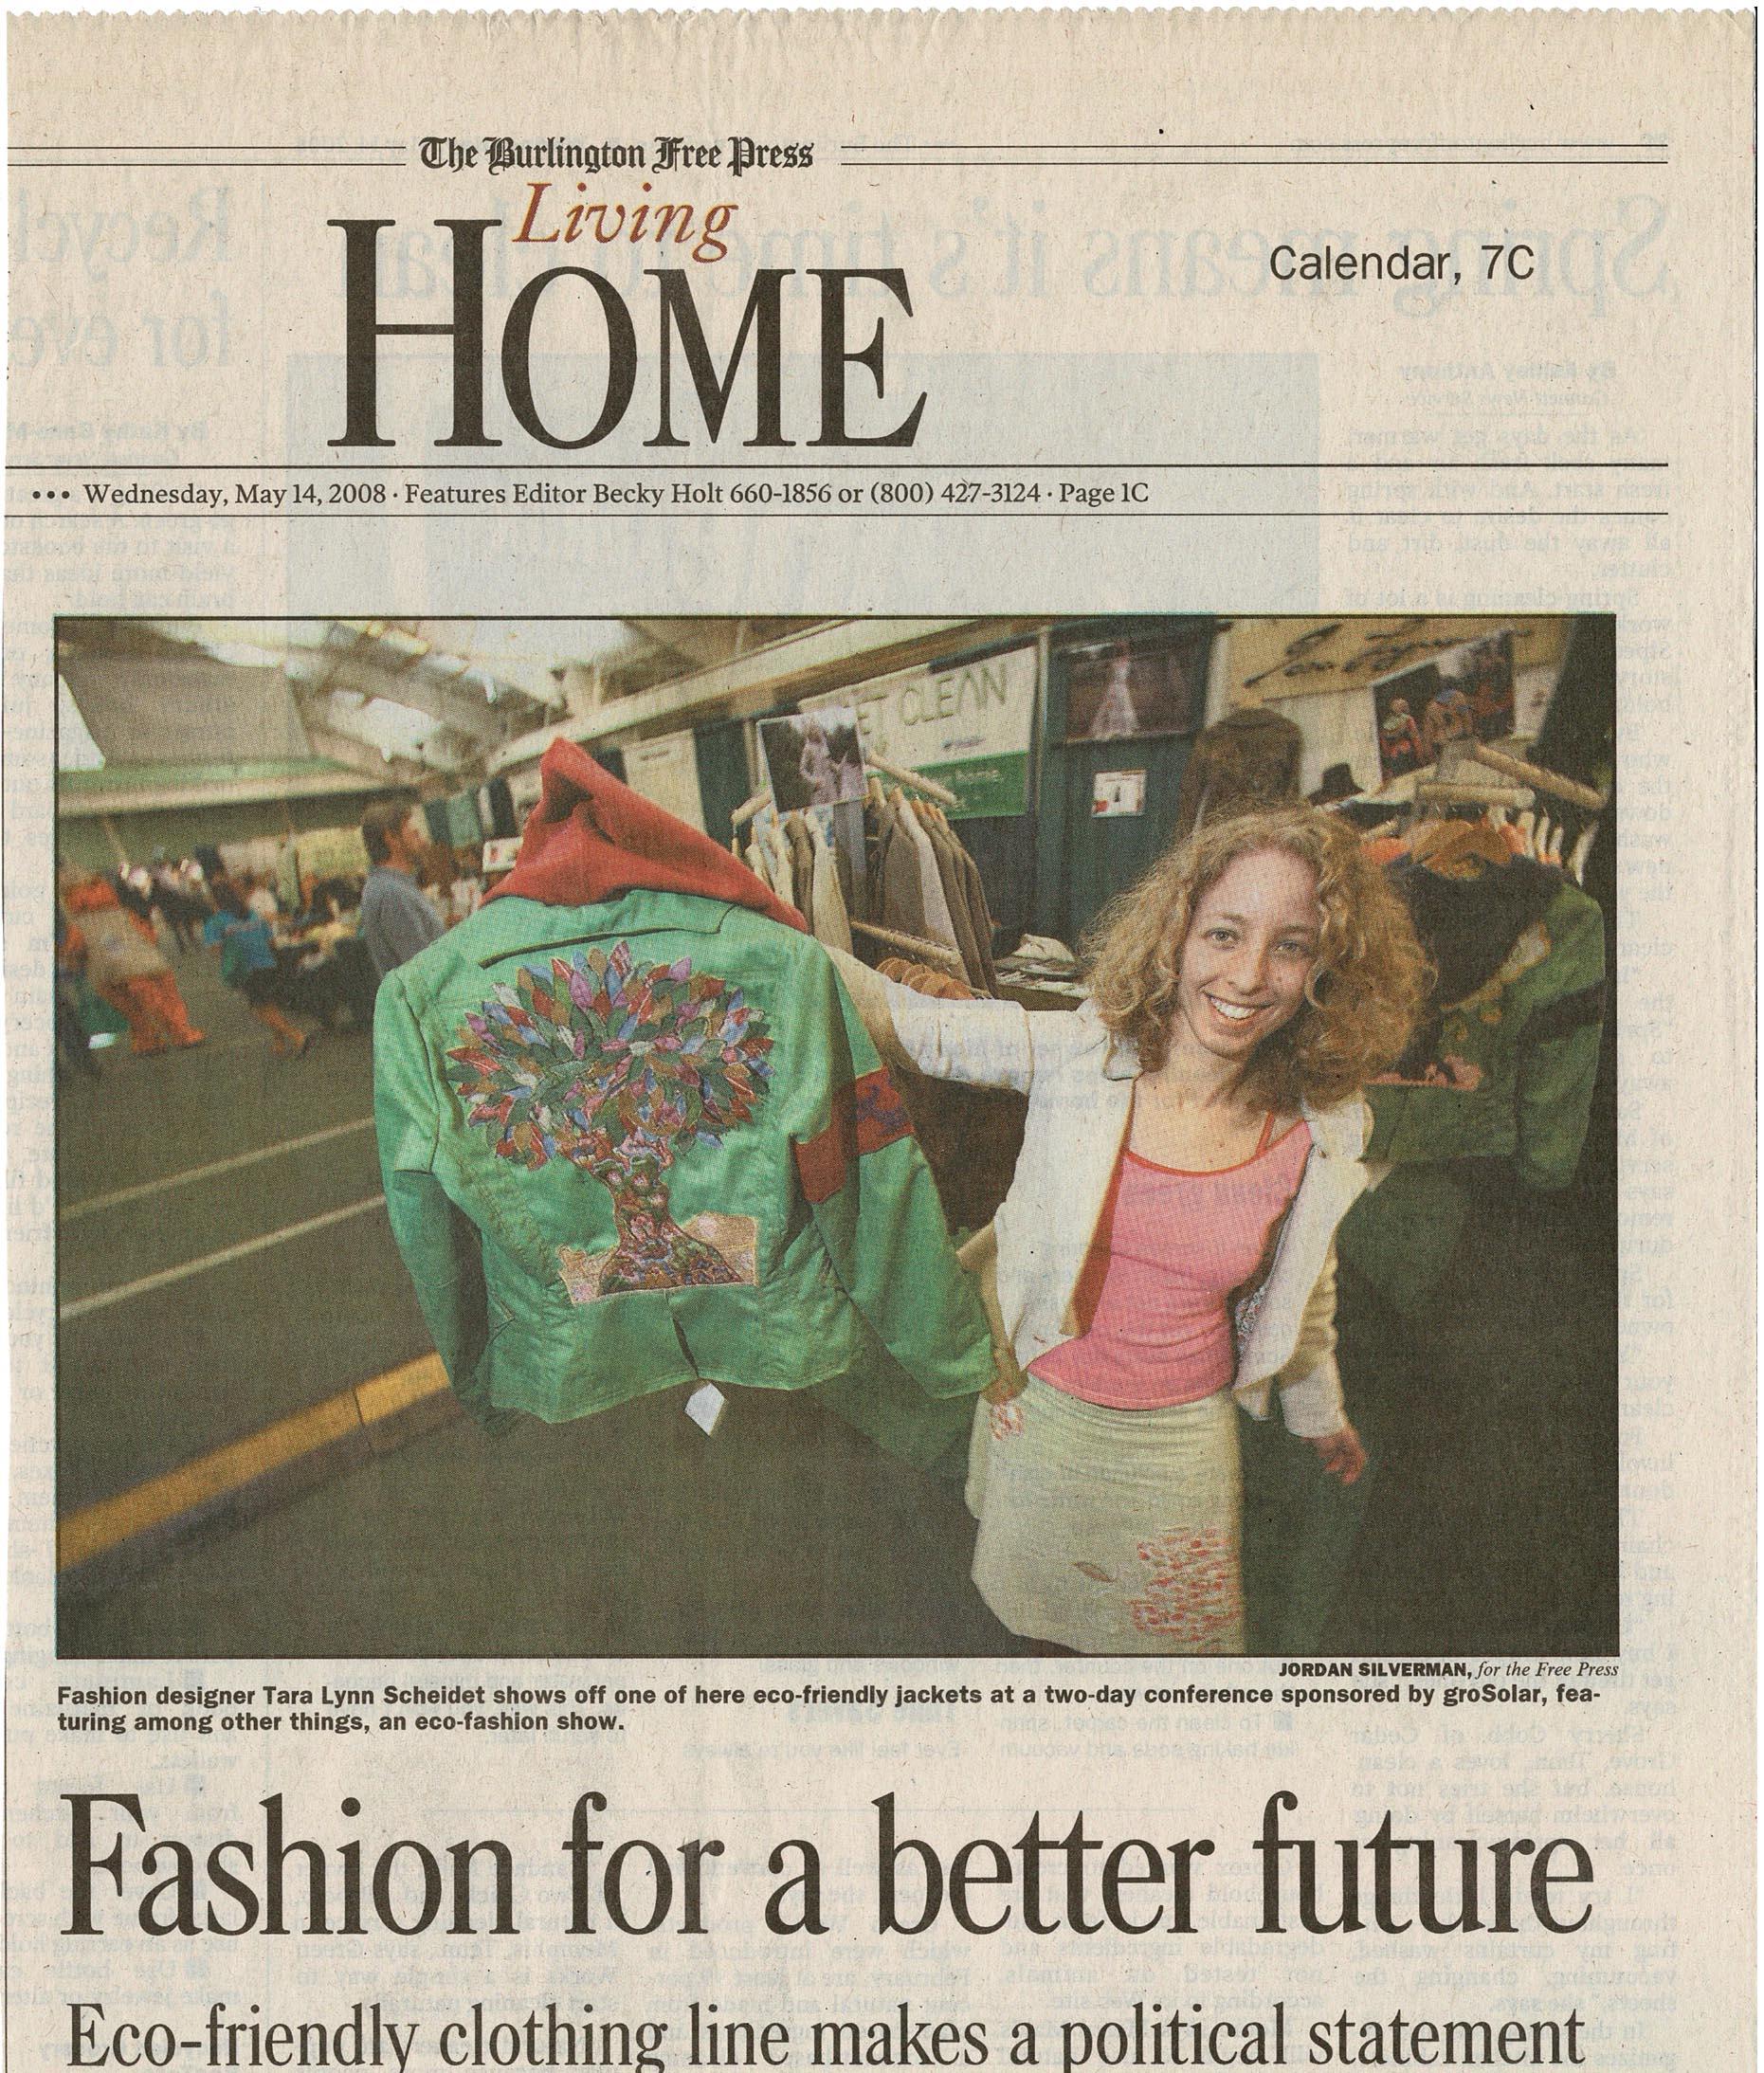 Fashion for a better future